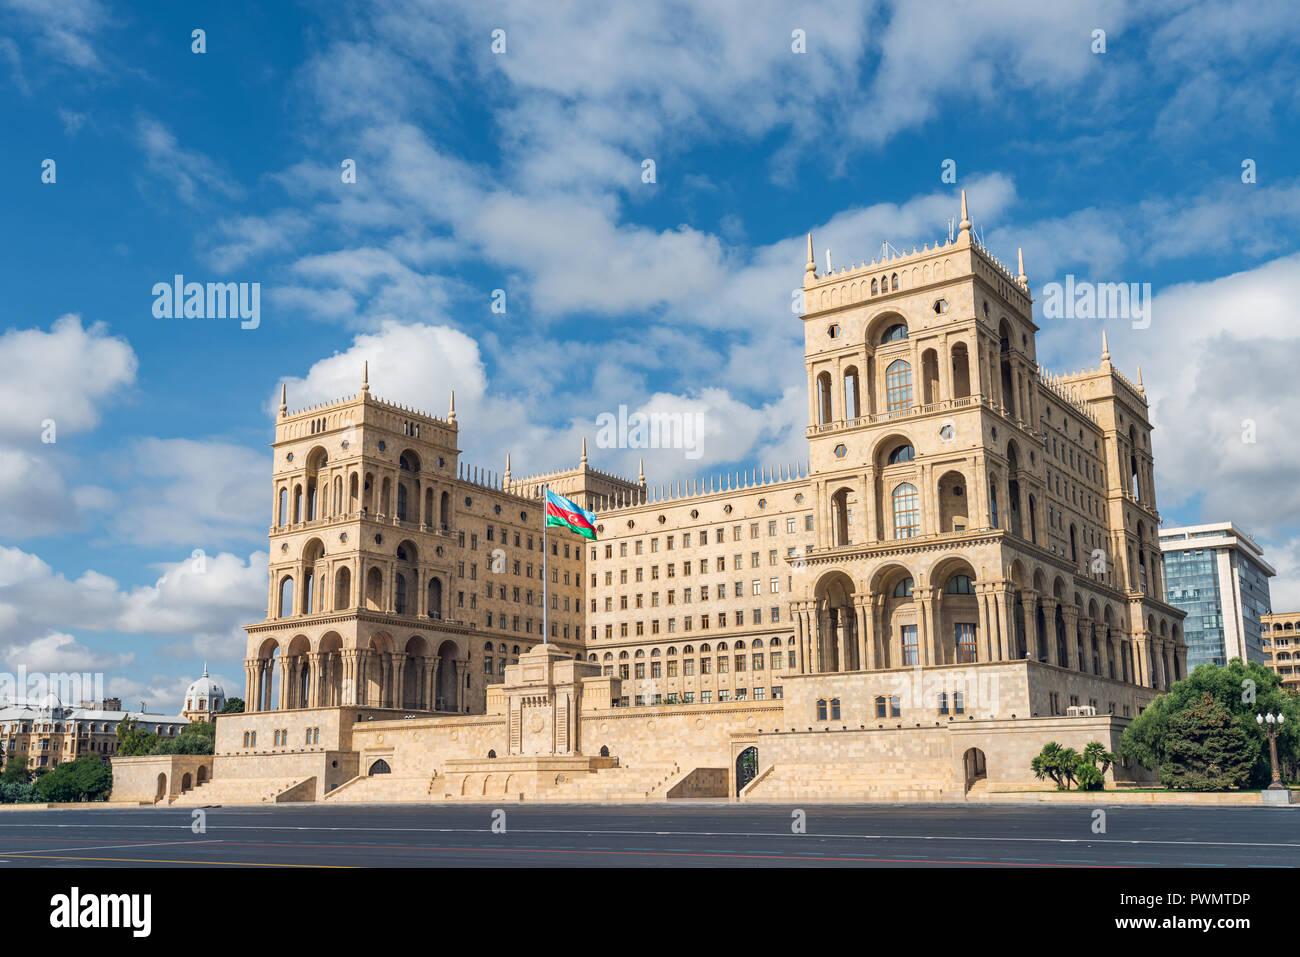 Government House in Baku city, Azerbaijan Republic Stock Photo